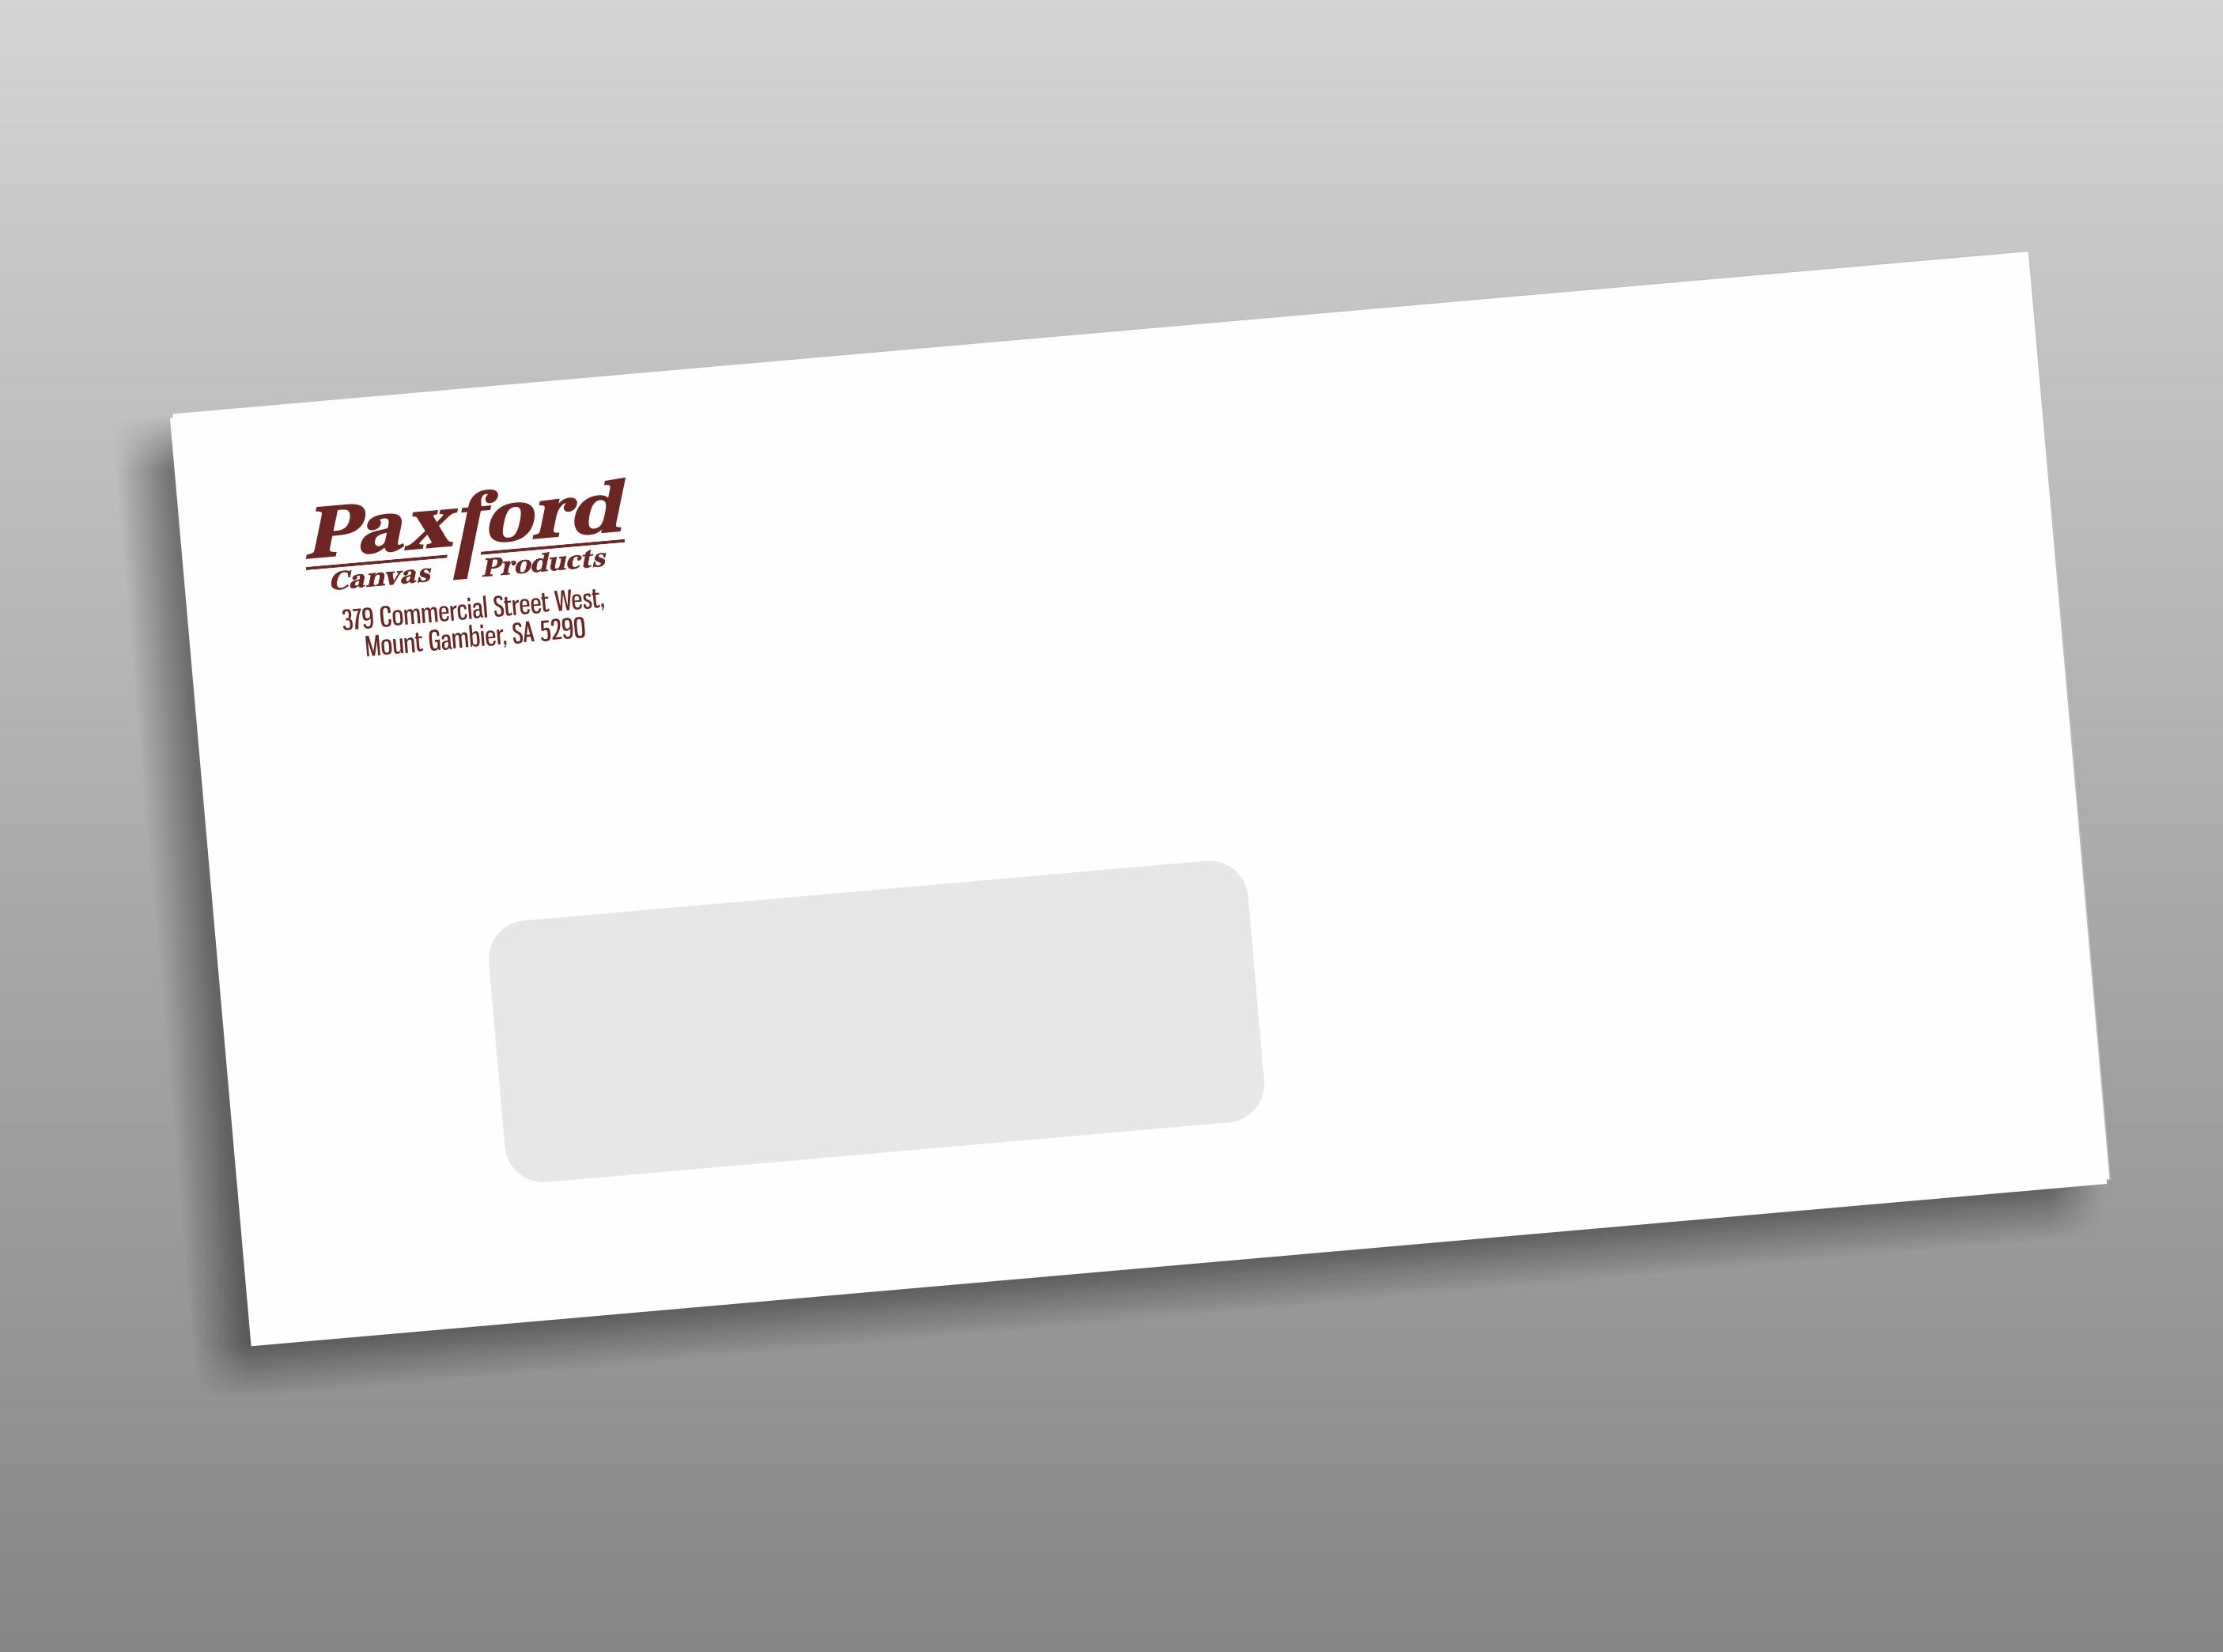 Paxfords Envelope